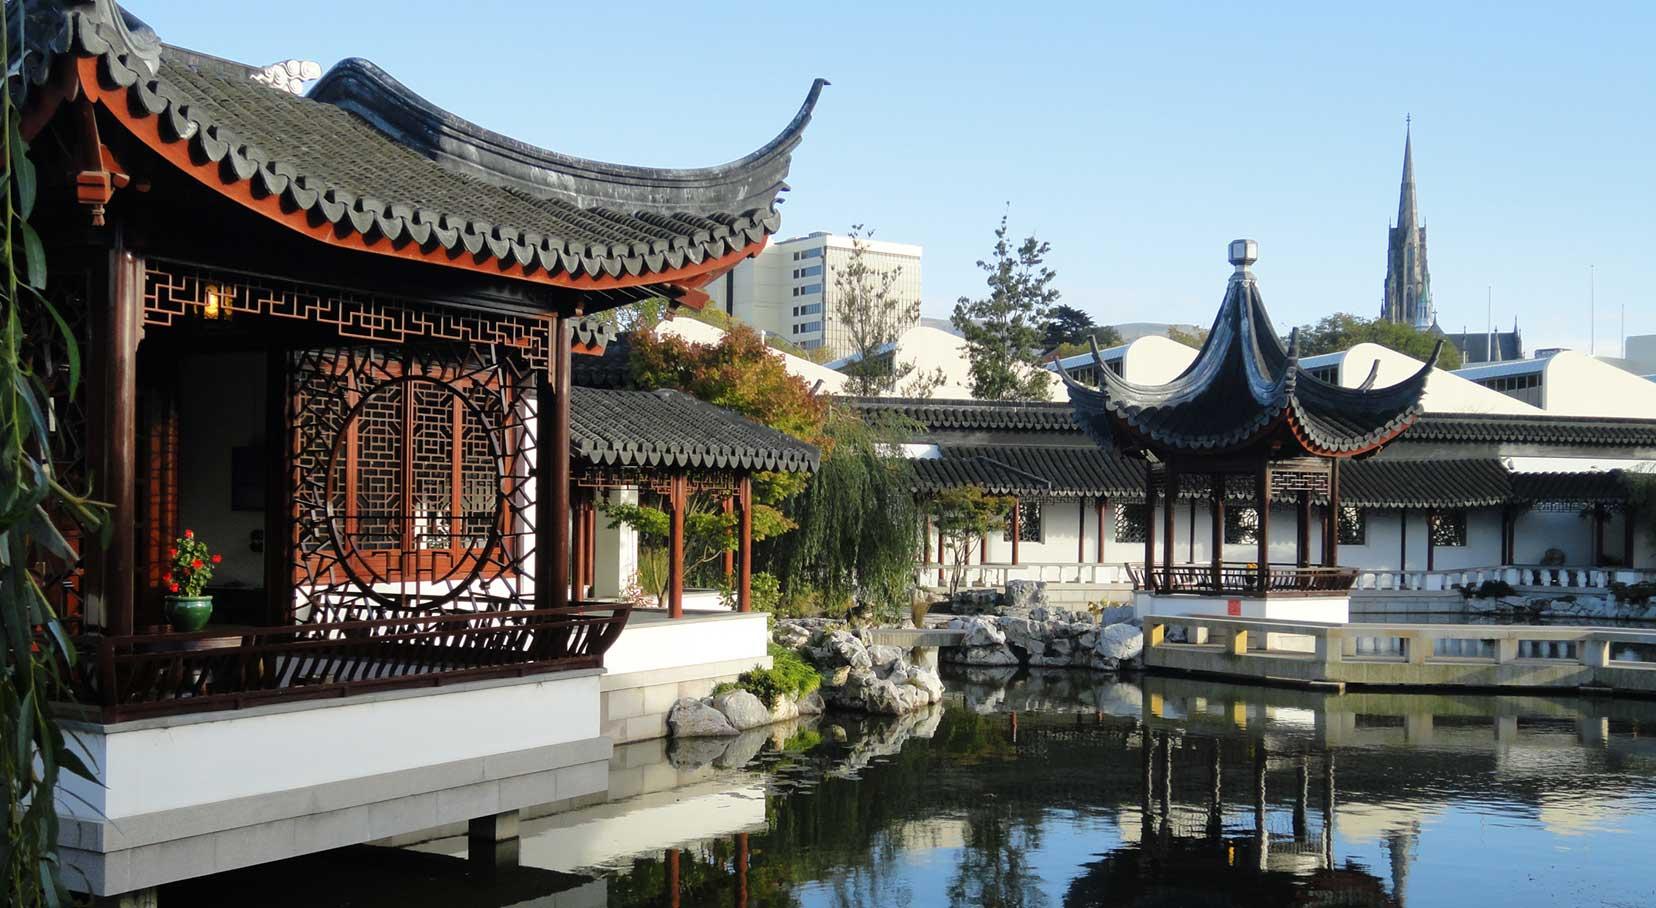 Dunedin Chinese Garden - Scholars Garden and study